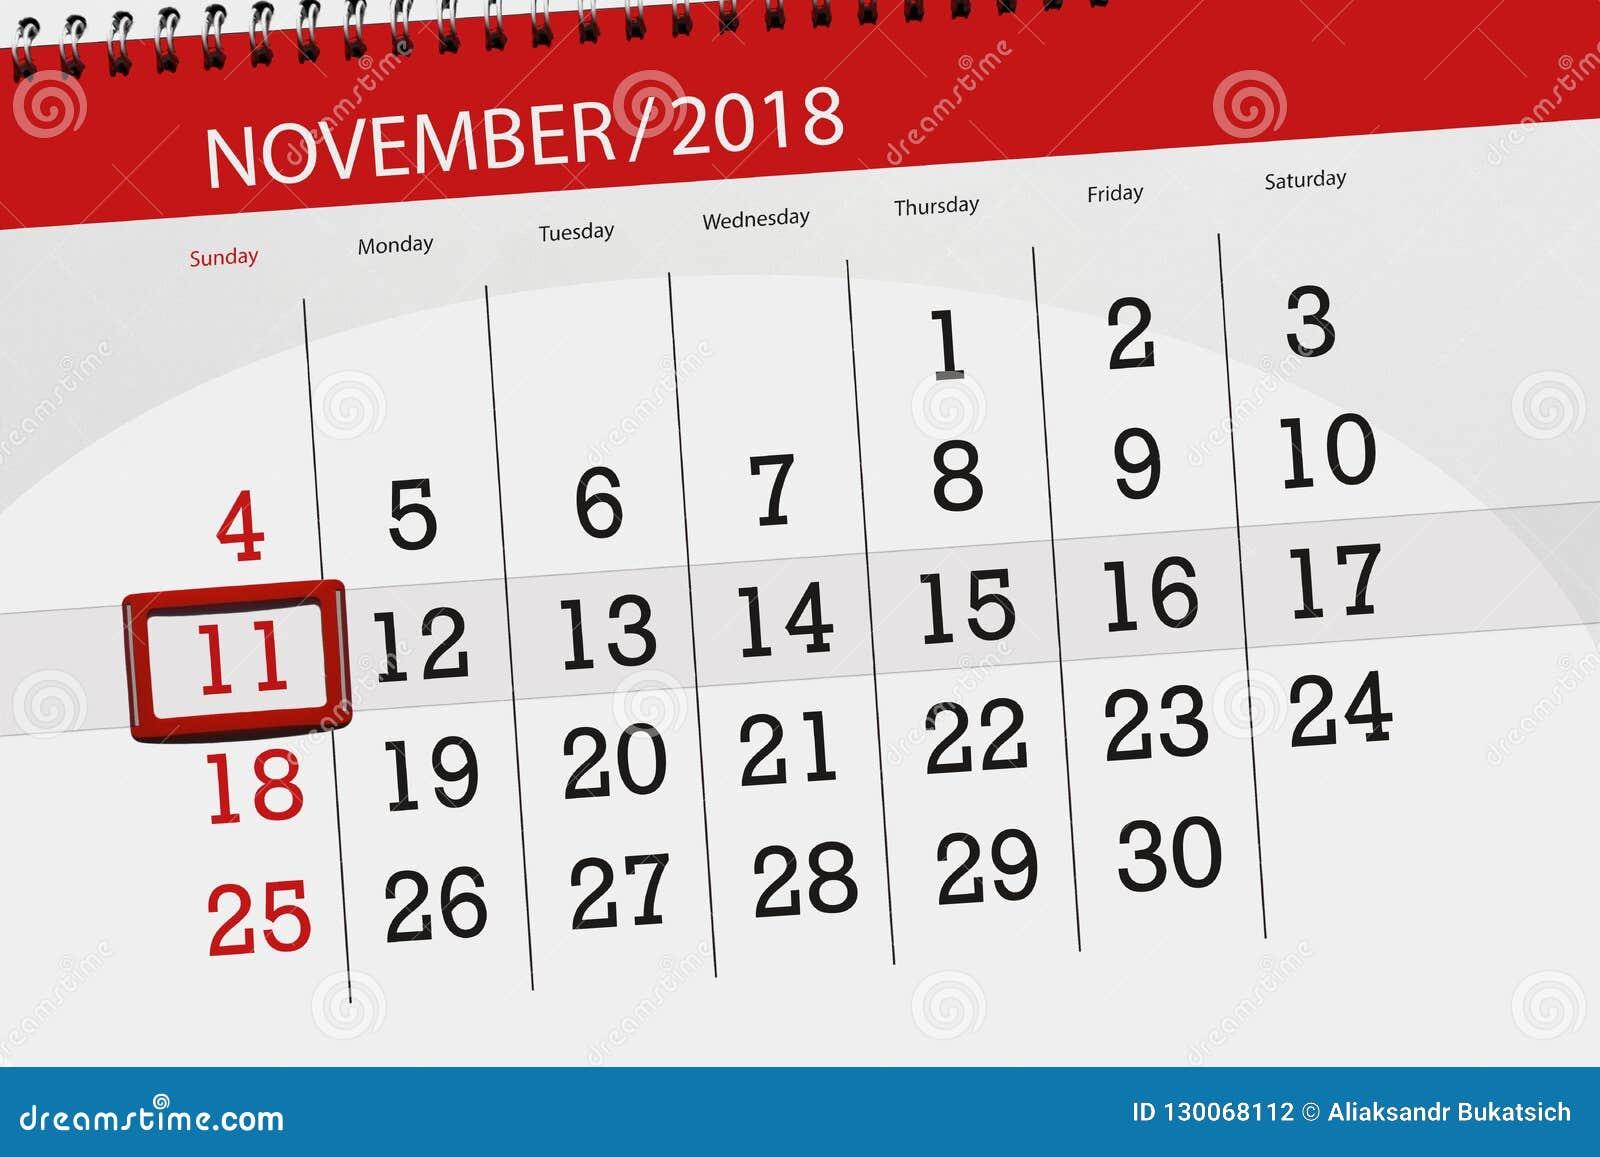 Calendar planner for the month, deadline day of the week 2018 november, 11, Sunday